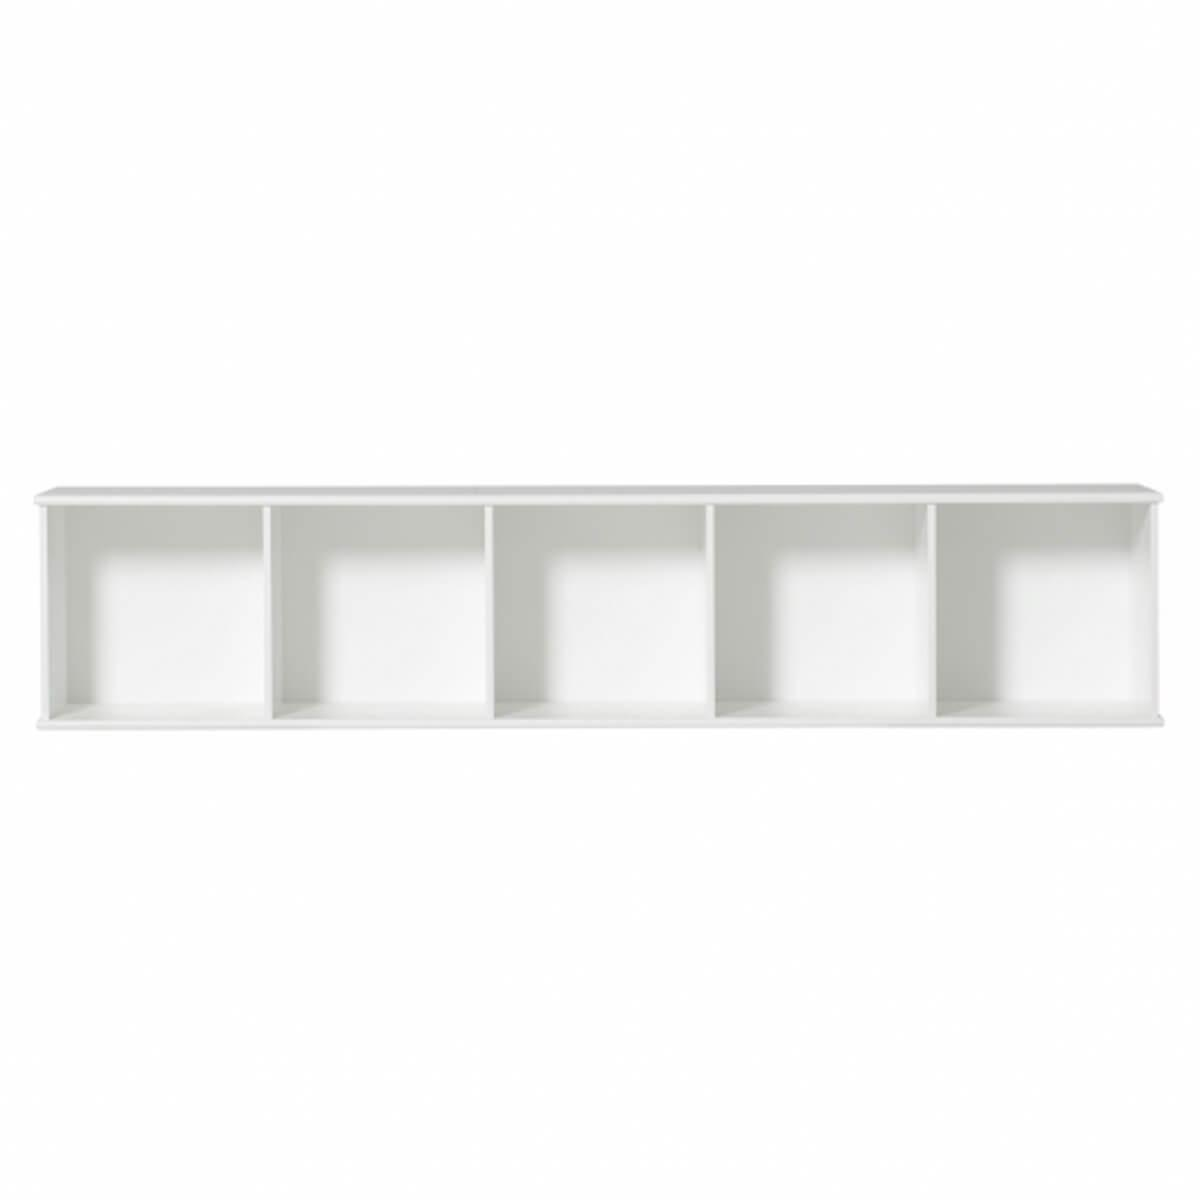 Estantería 174x36cm WOOD Oliver Furniture blanco